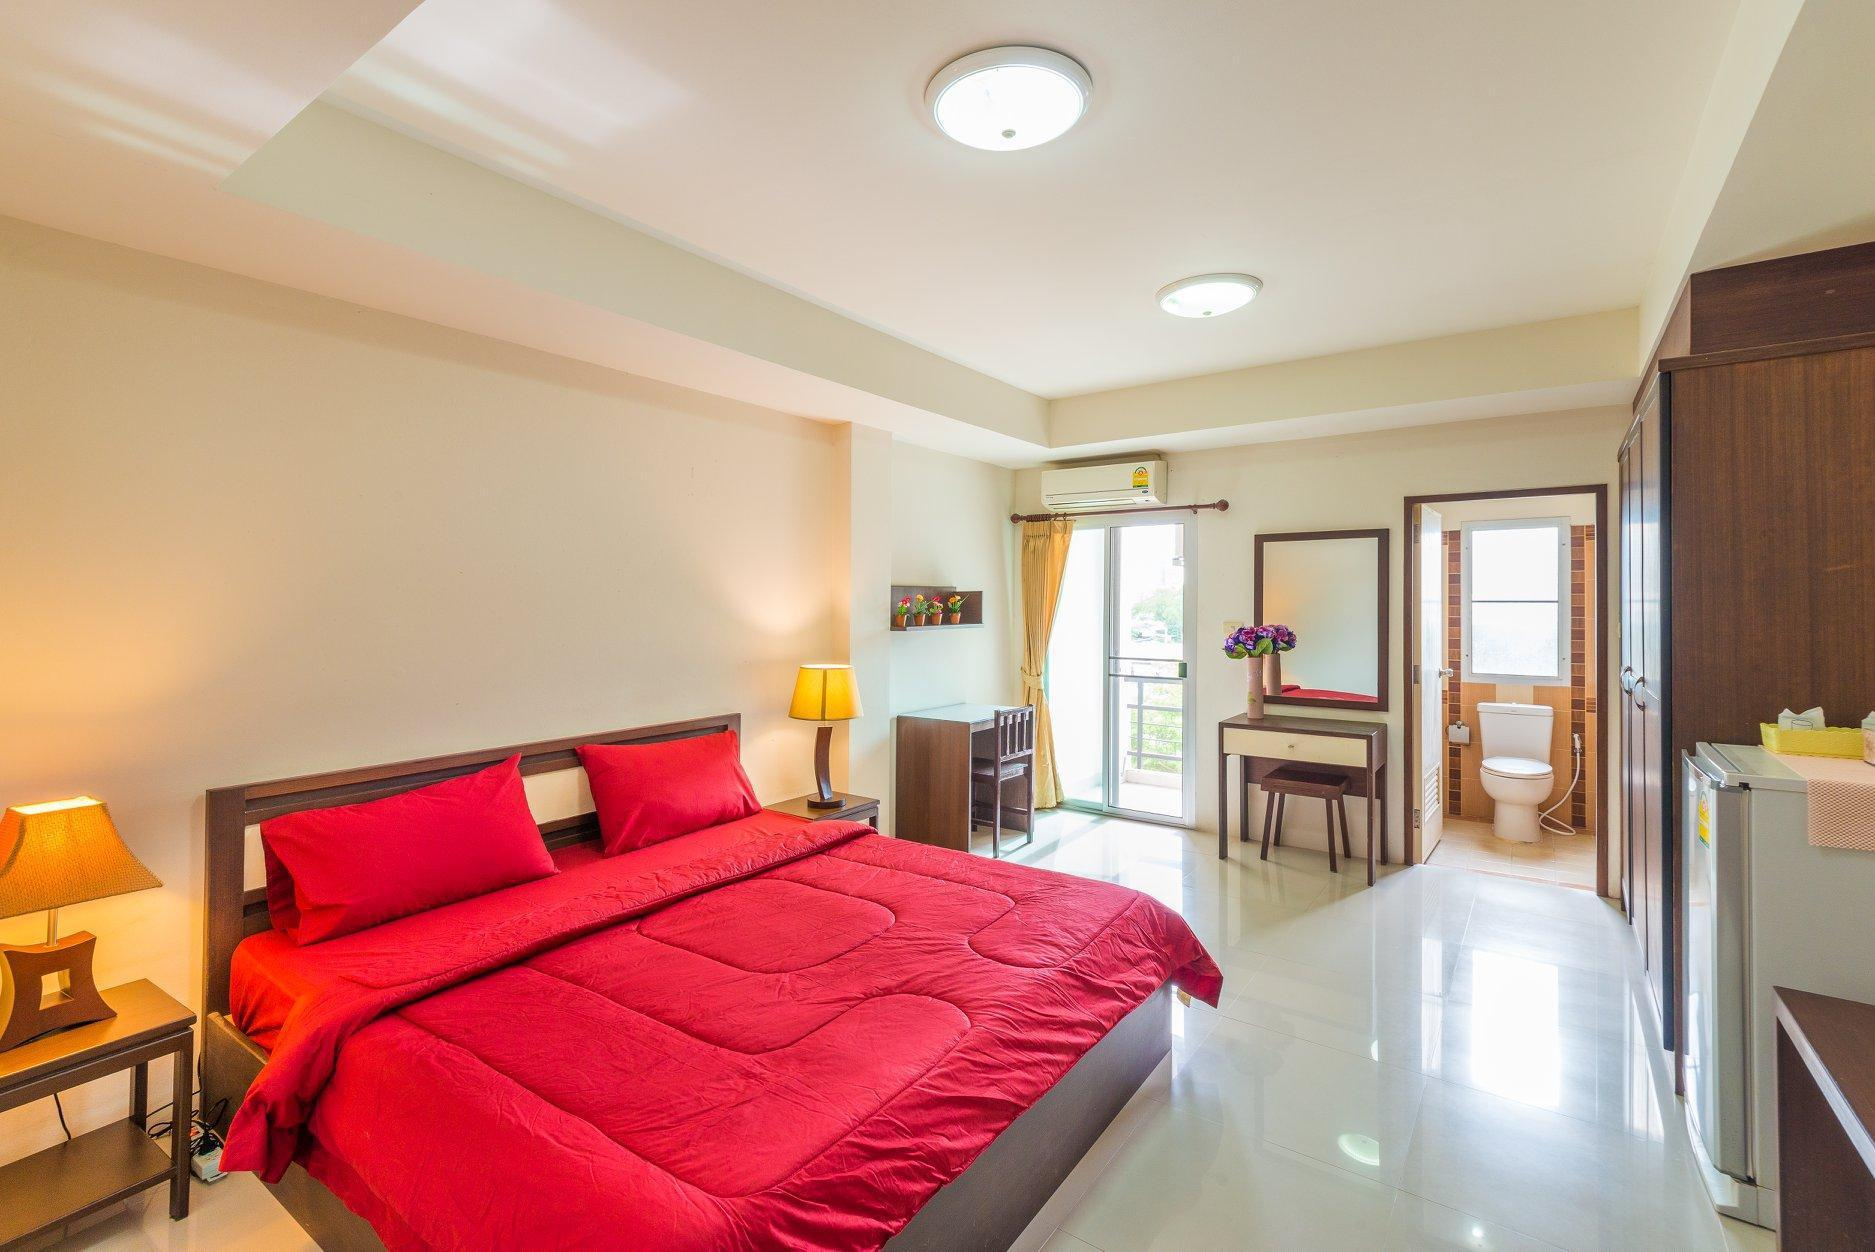 Tawana Residence Pattaya #3 สตูดิโอ อพาร์ตเมนต์ 1 ห้องน้ำส่วนตัว ขนาด 30 ตร.ม. – พัทยากลาง